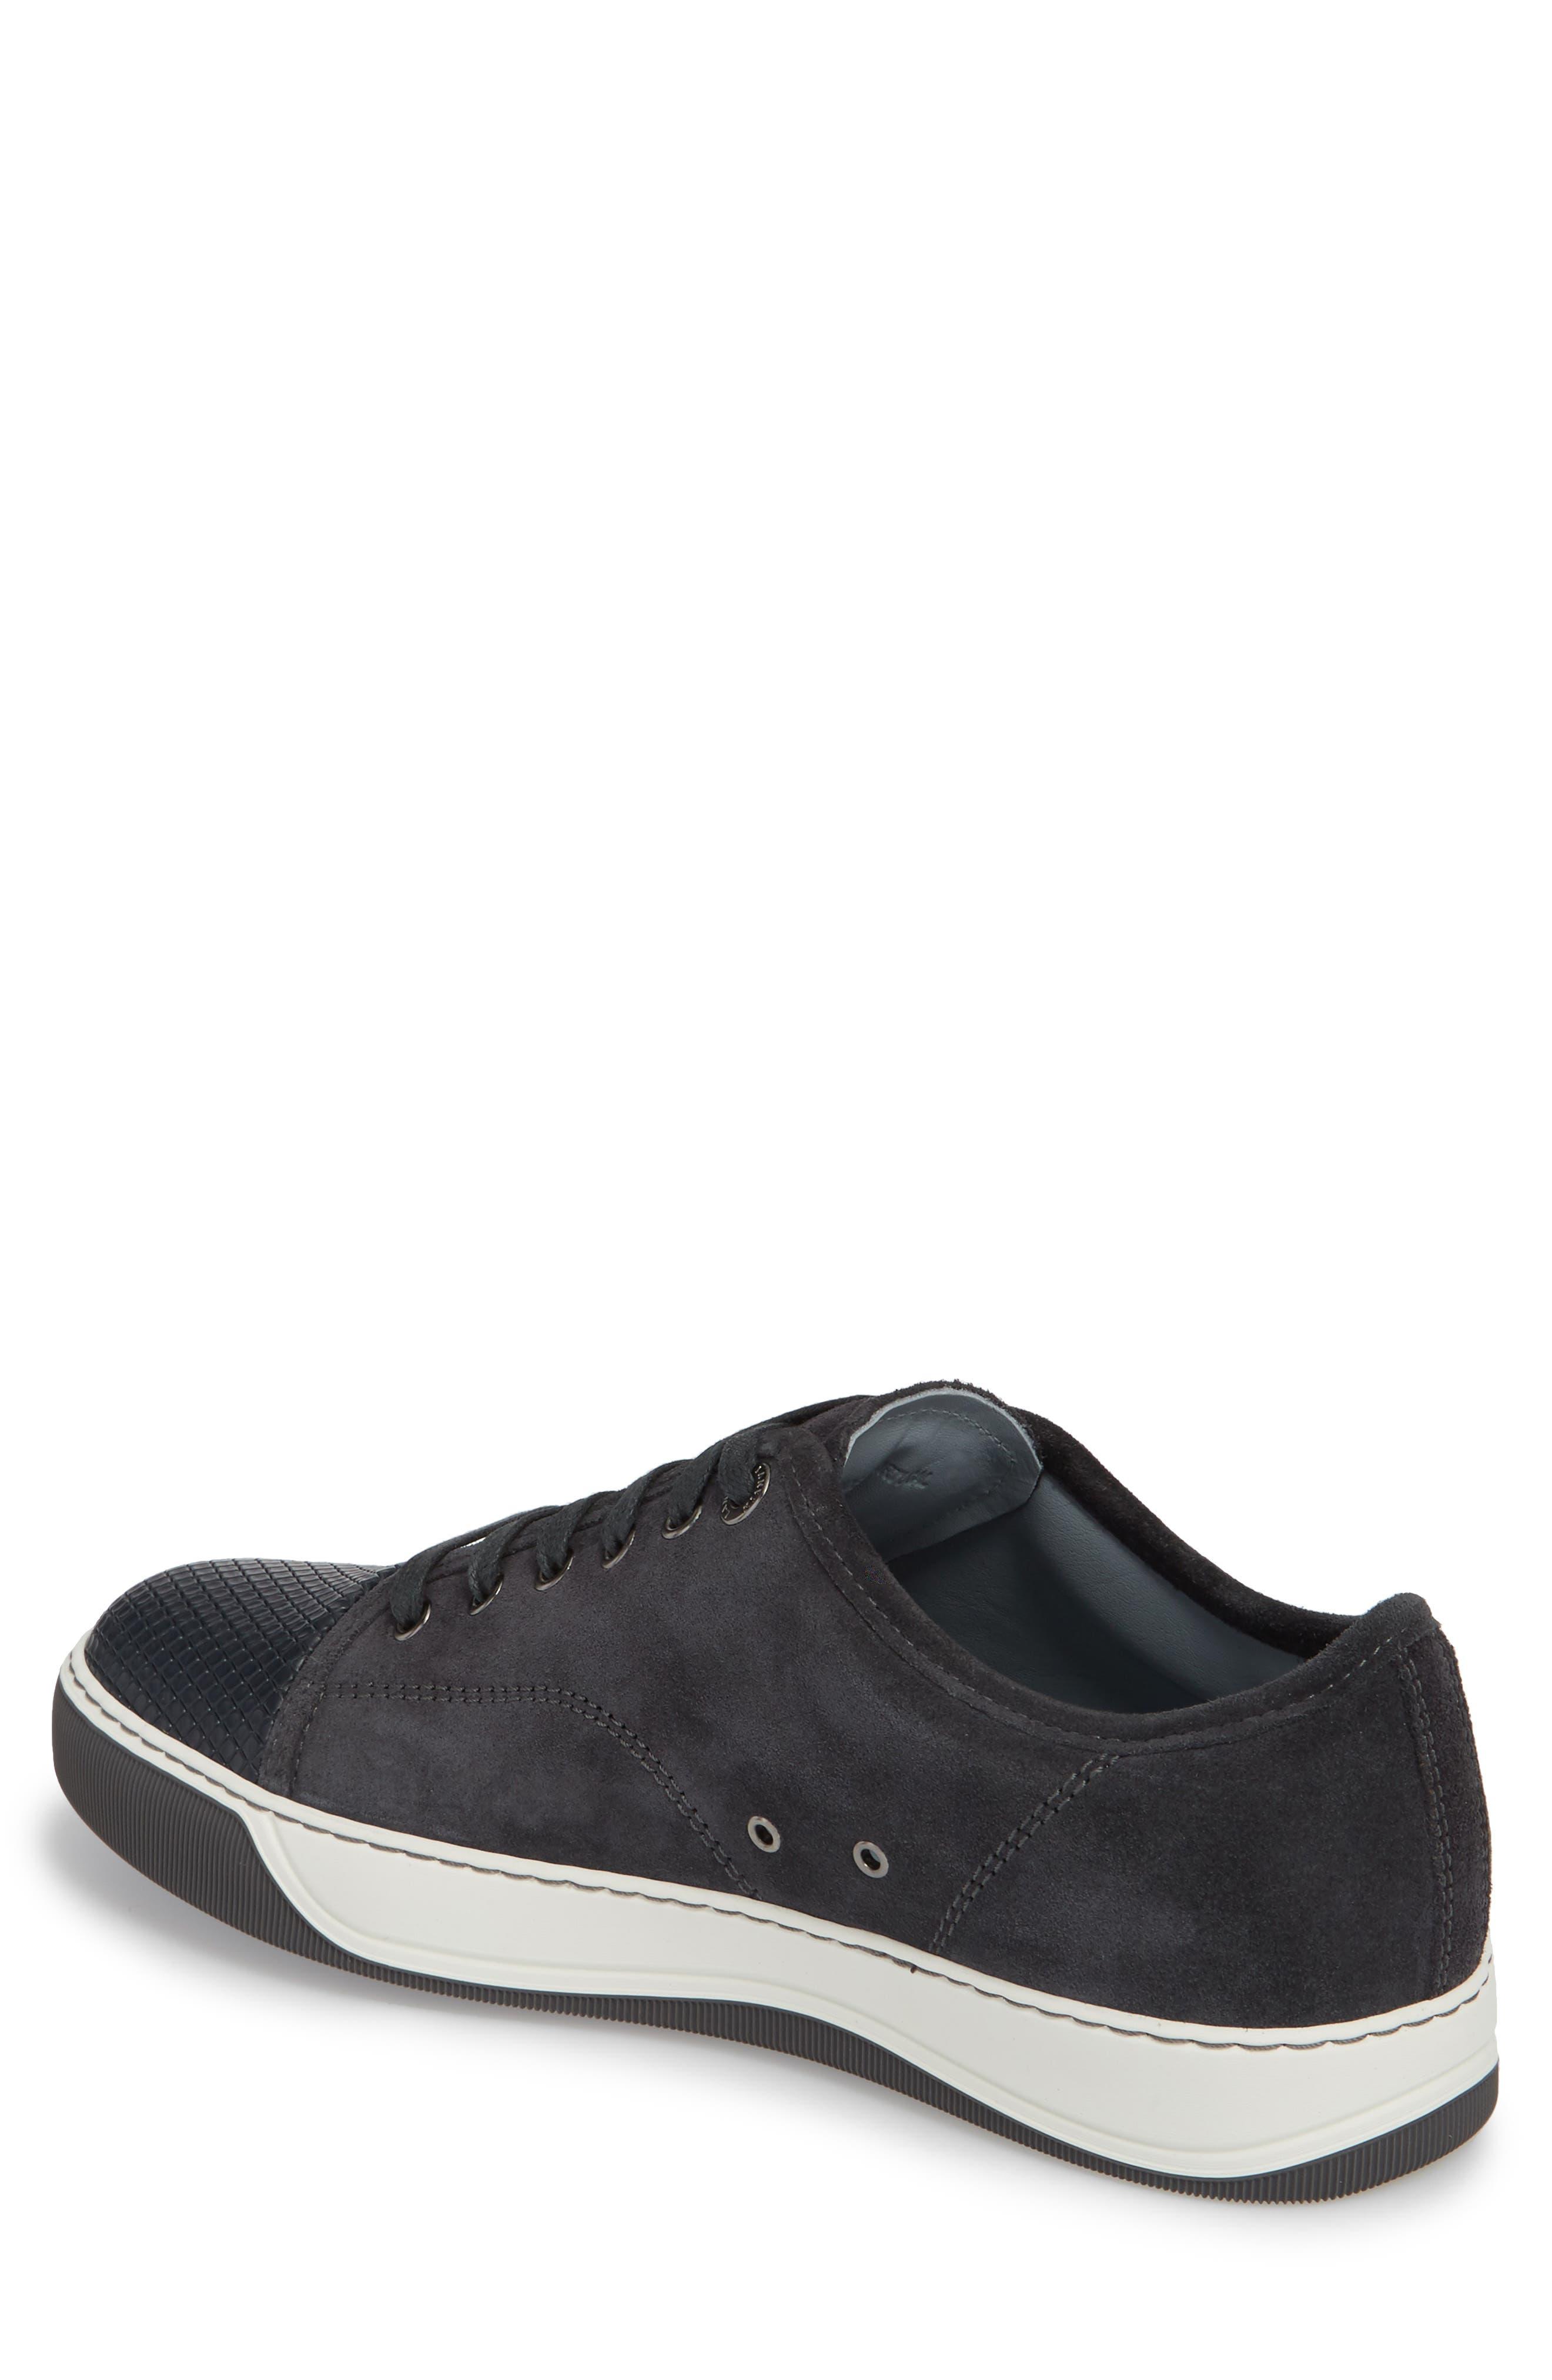 Alternate Image 2  - Lanvin Classic Textured Cap Toe Sneaker (Men)